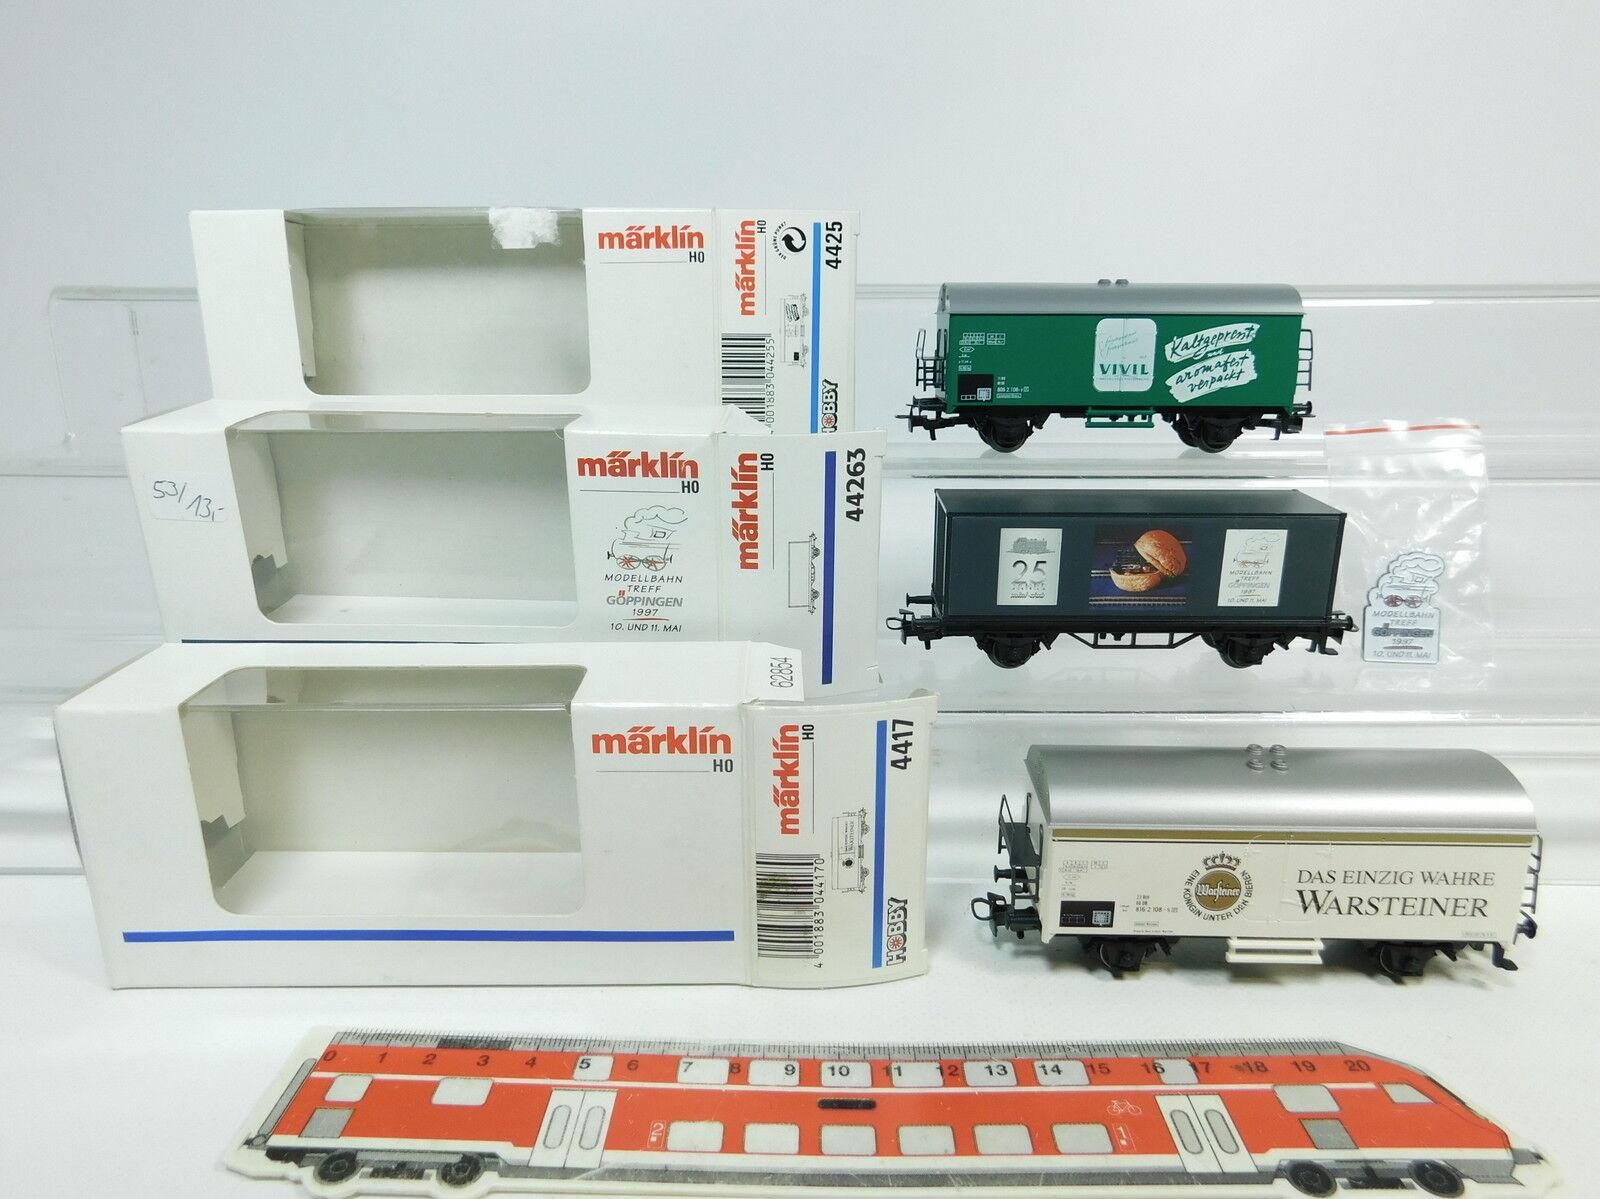 Az208-0, 5x Märklin h0 ac Freight Cars  4417 Warsteiner +4425+44263, NEUW + OVP